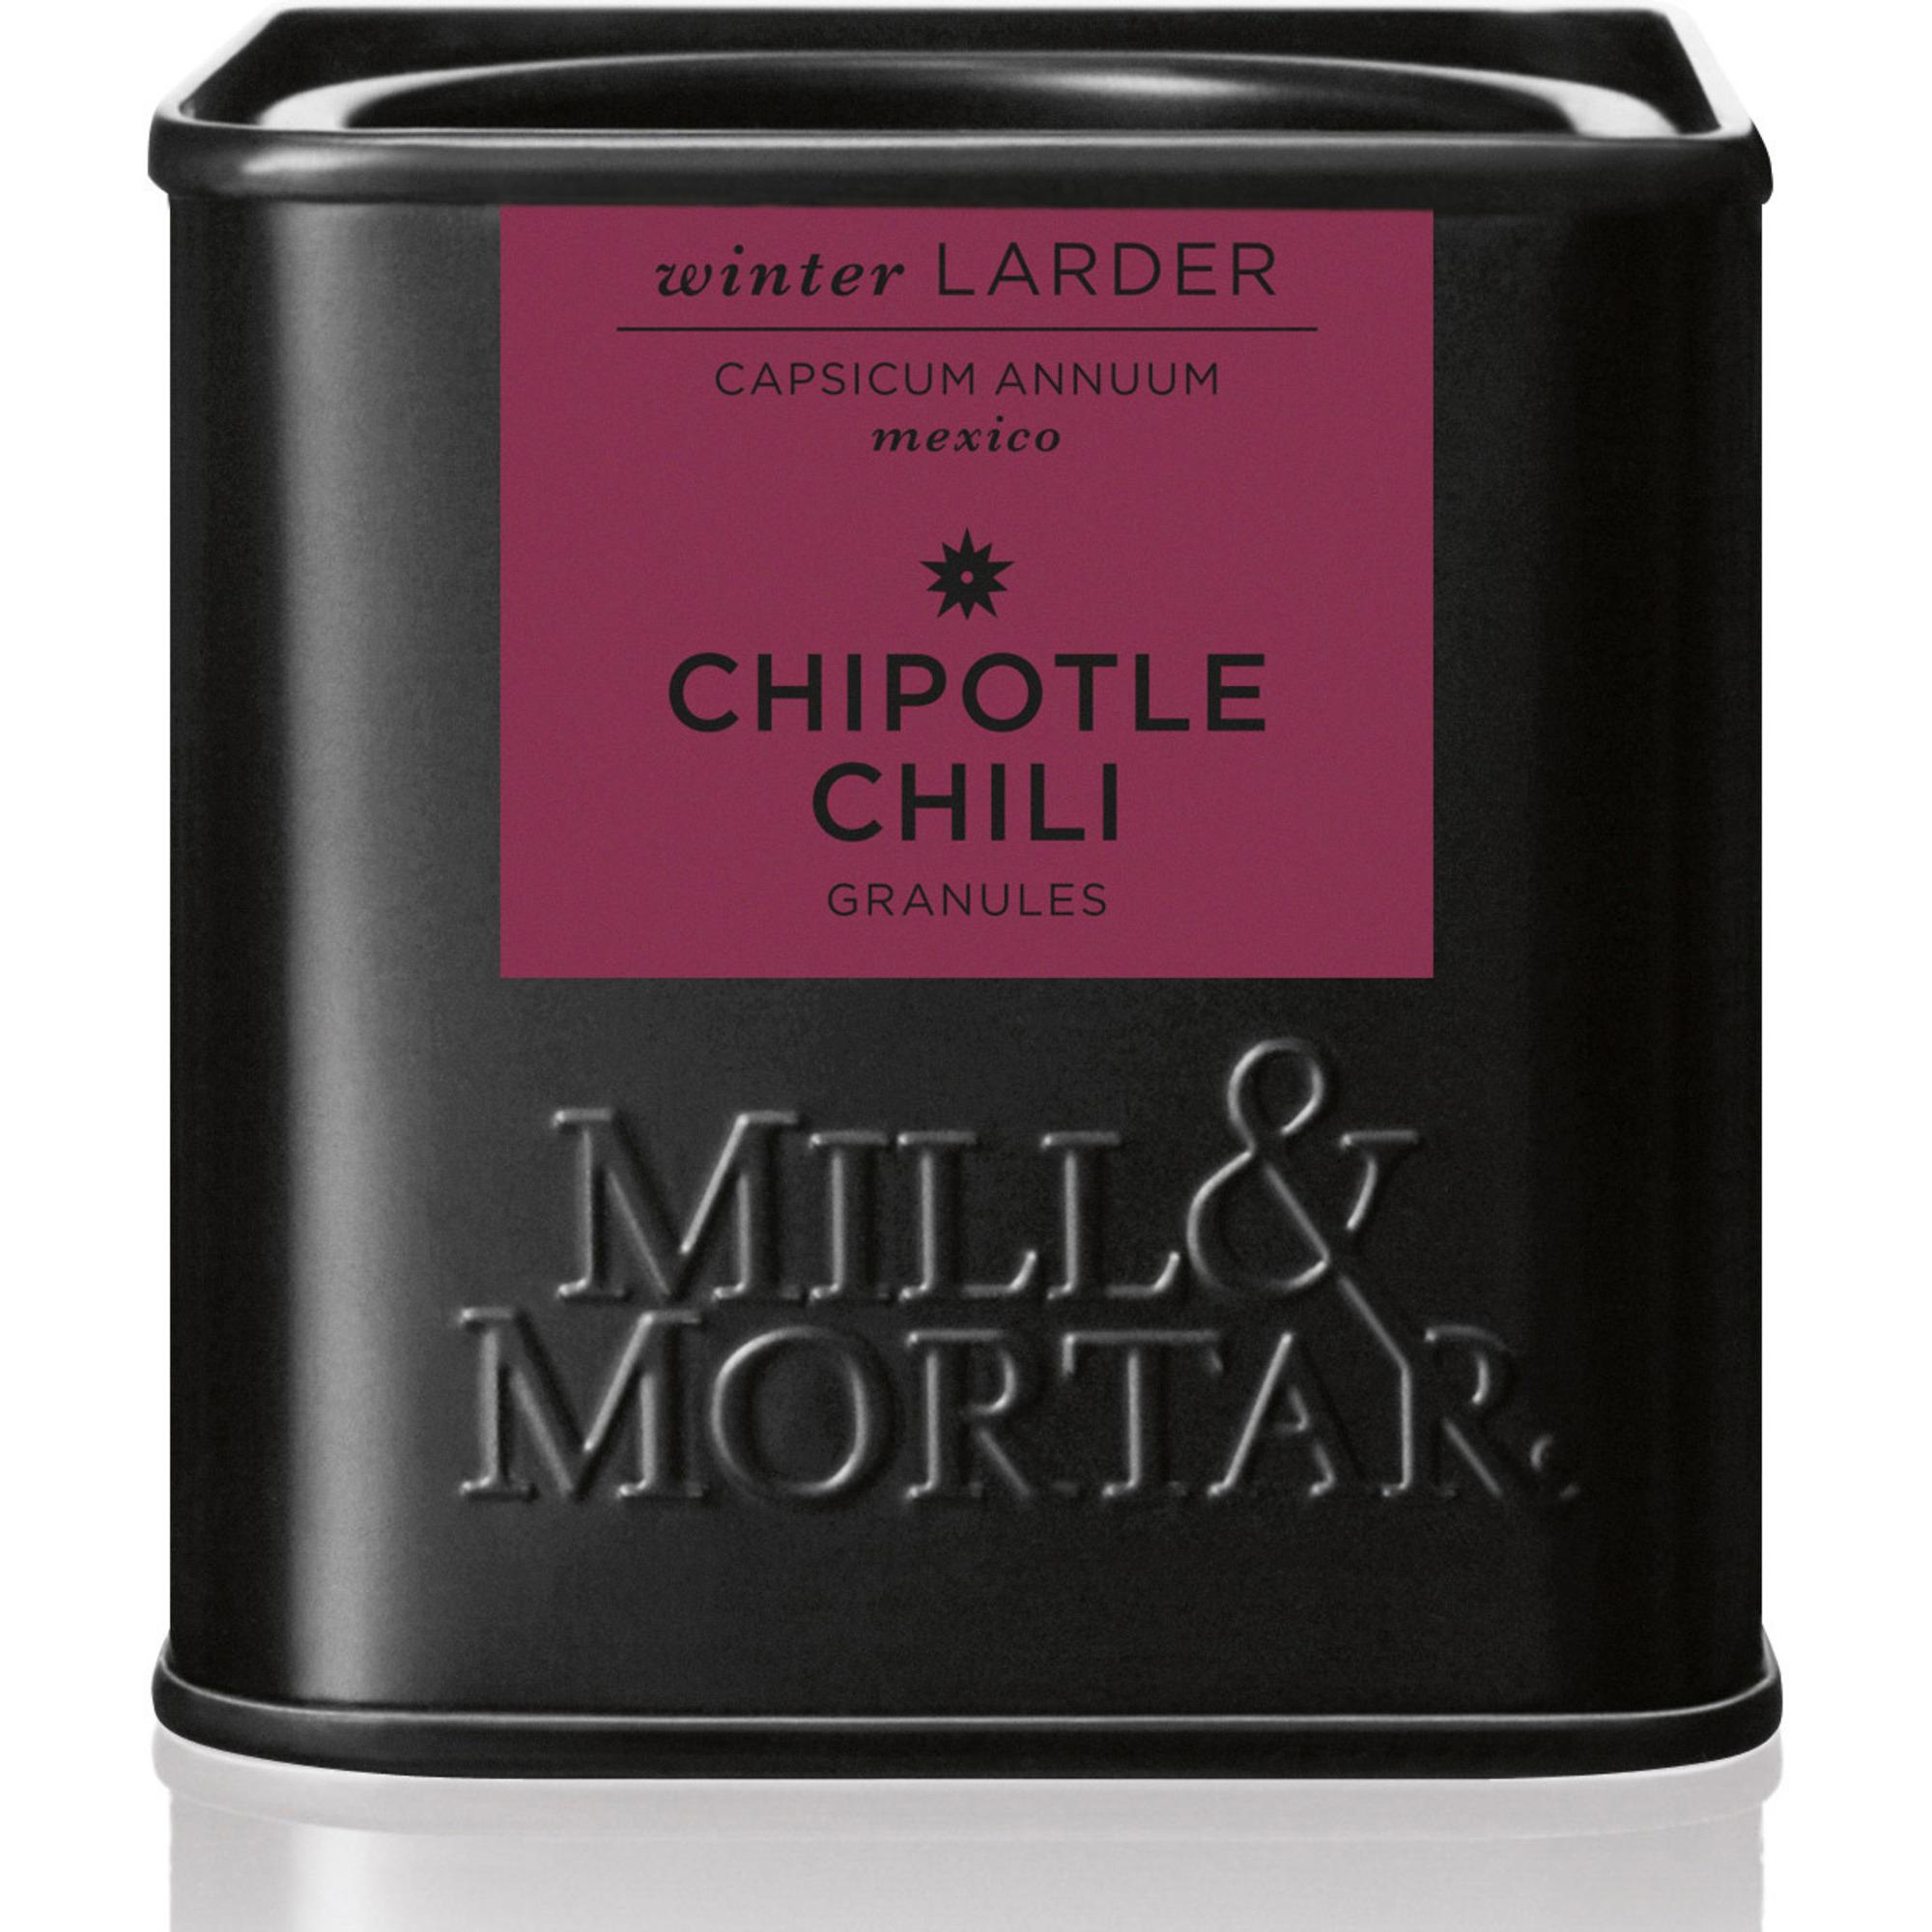 Mill & Mortar Chipotle Chiliflakes